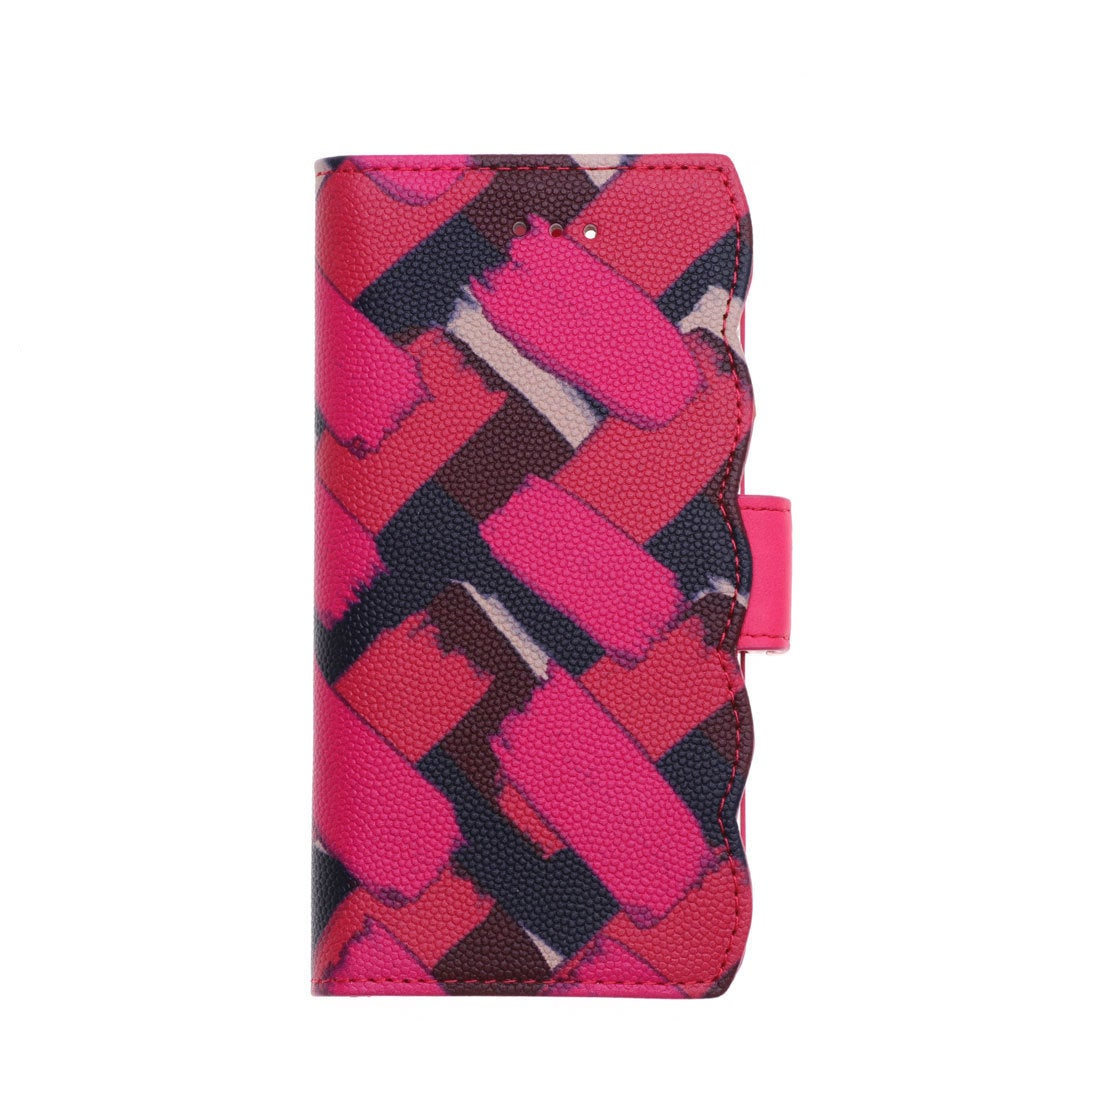 0b3e5cc7f1 ツモリチサト キャリー tsumori chisato CARRY ラパンメッシュ (ピンク) -靴&ファッション通販 ロコンド〜自宅で試着、気軽に返品